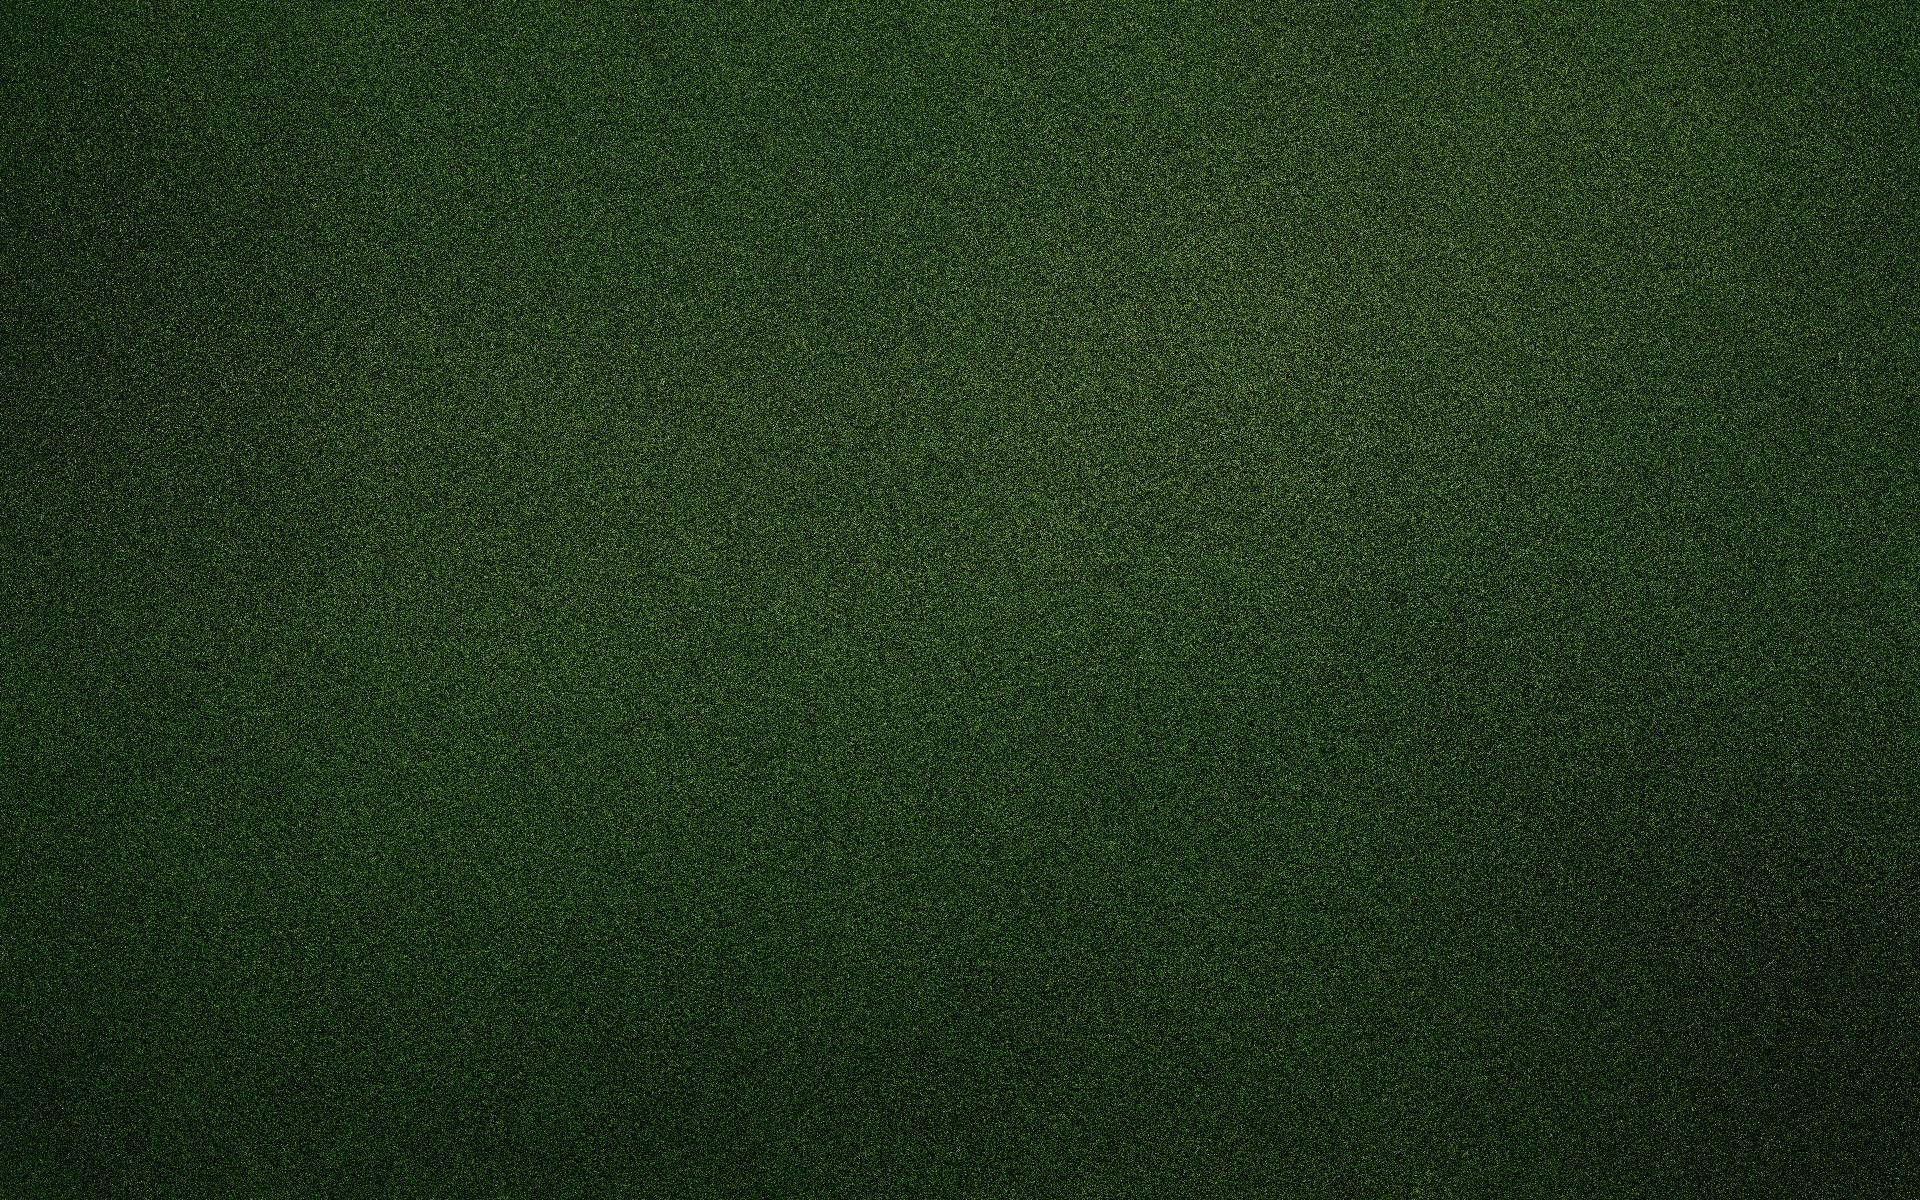 Dark green backgrounds wallpaper cave for Wallpaper for walls